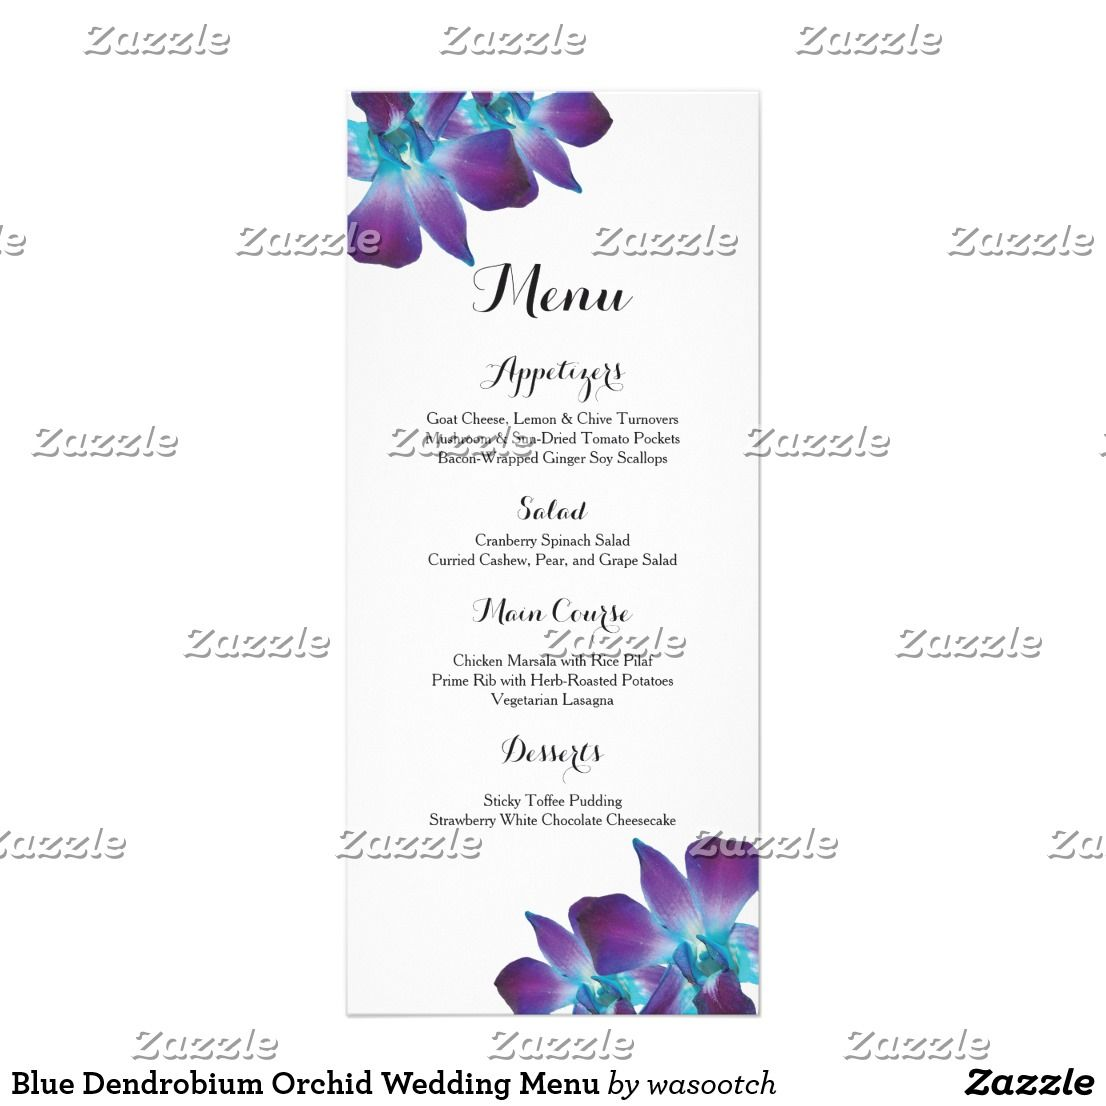 Blue dendrobium orchid wedding menu dendrobium orchids menu cards